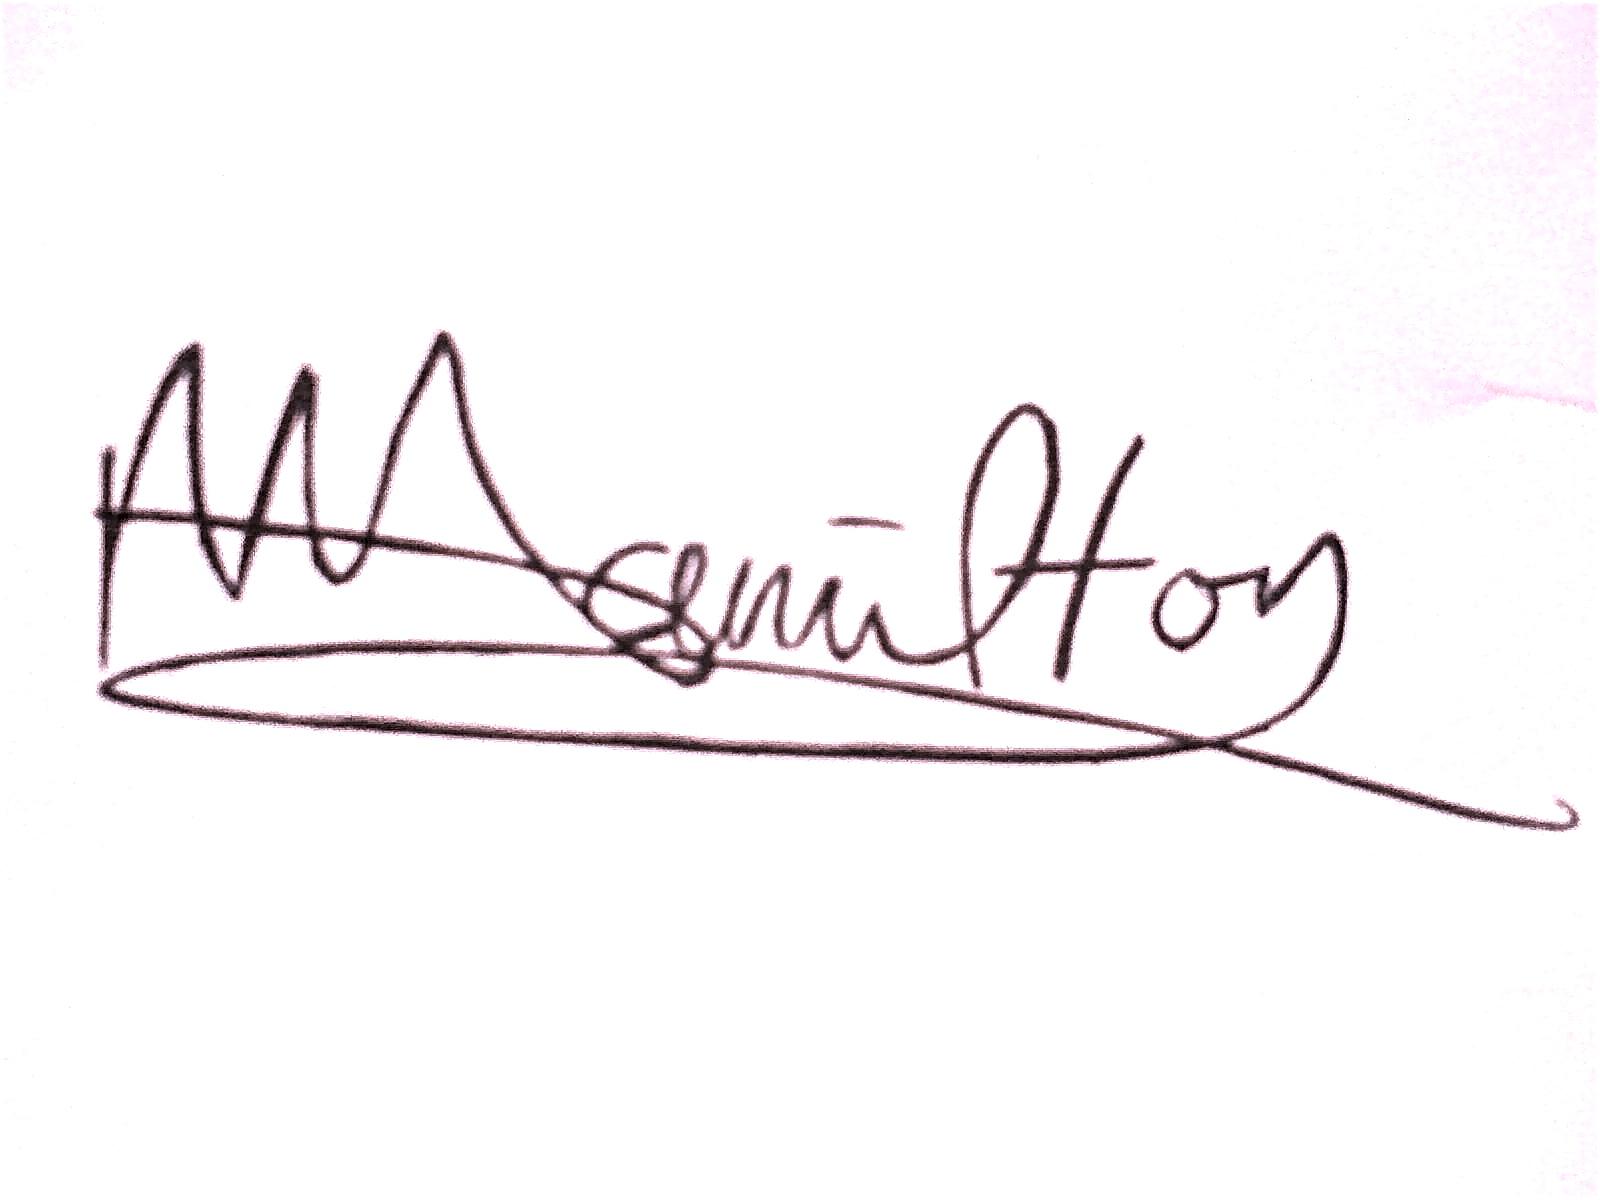 Melissa Hamilton Autograph